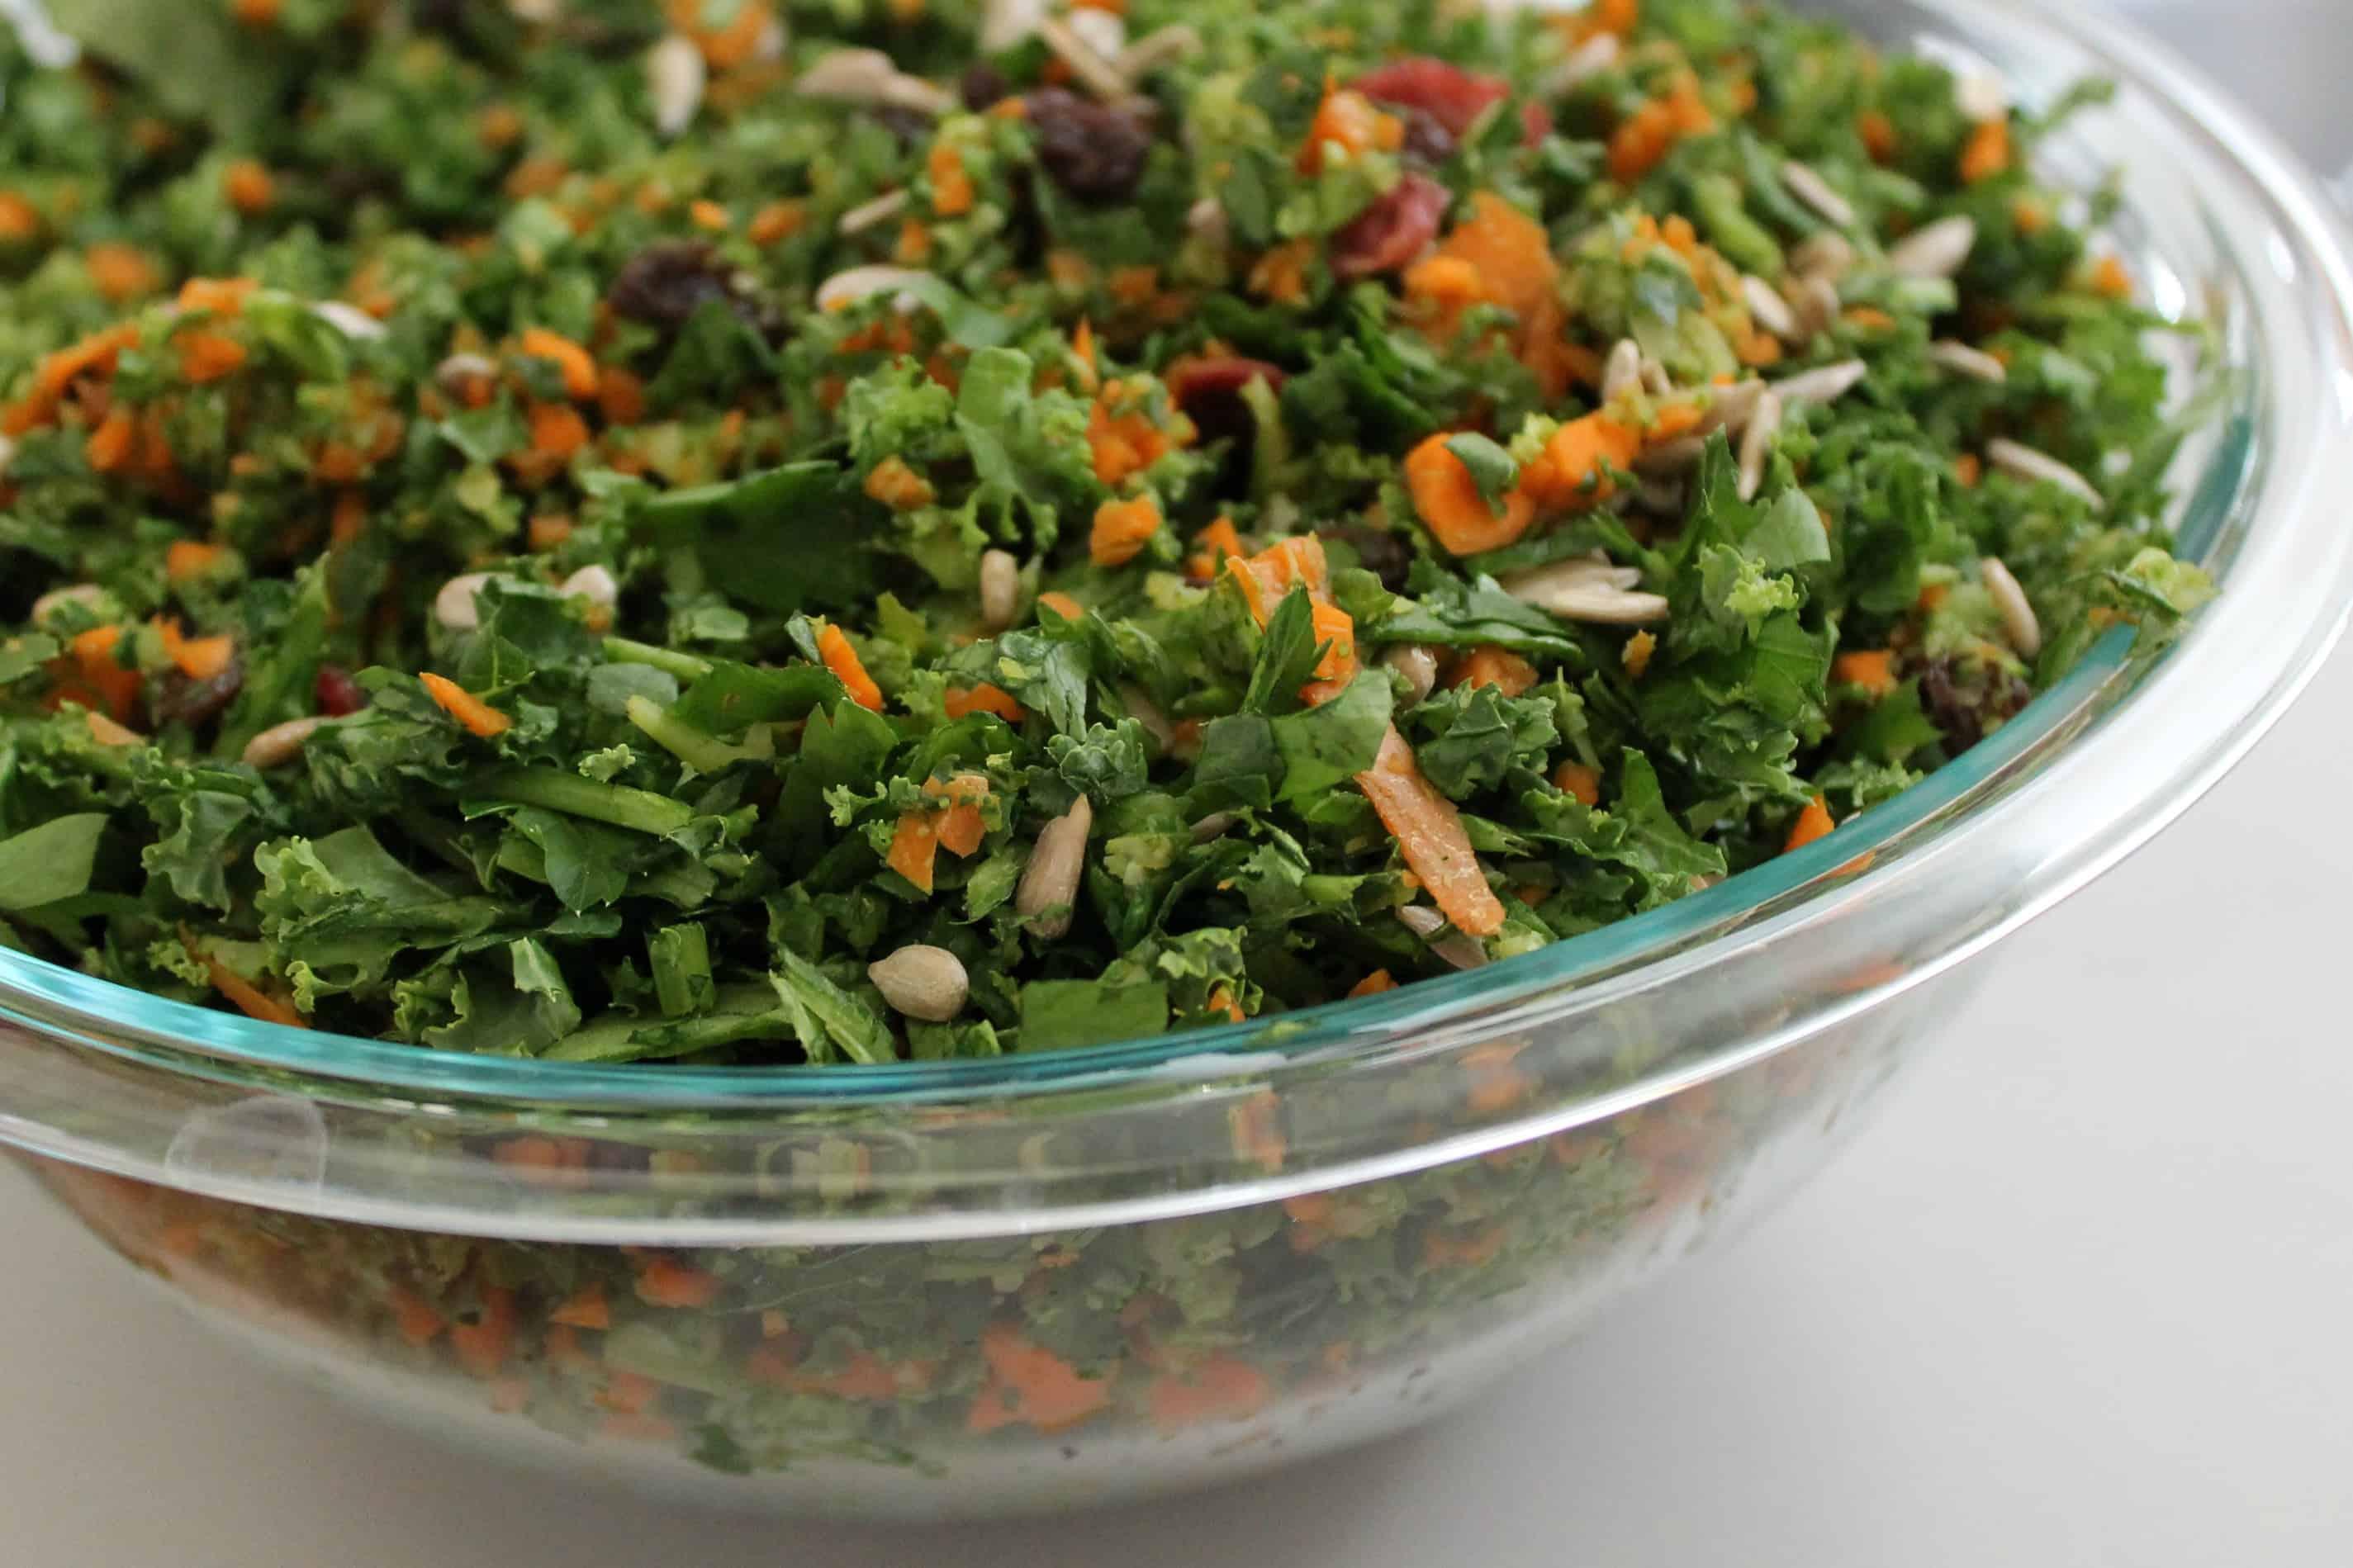 Detox Salad - The Workout Mama